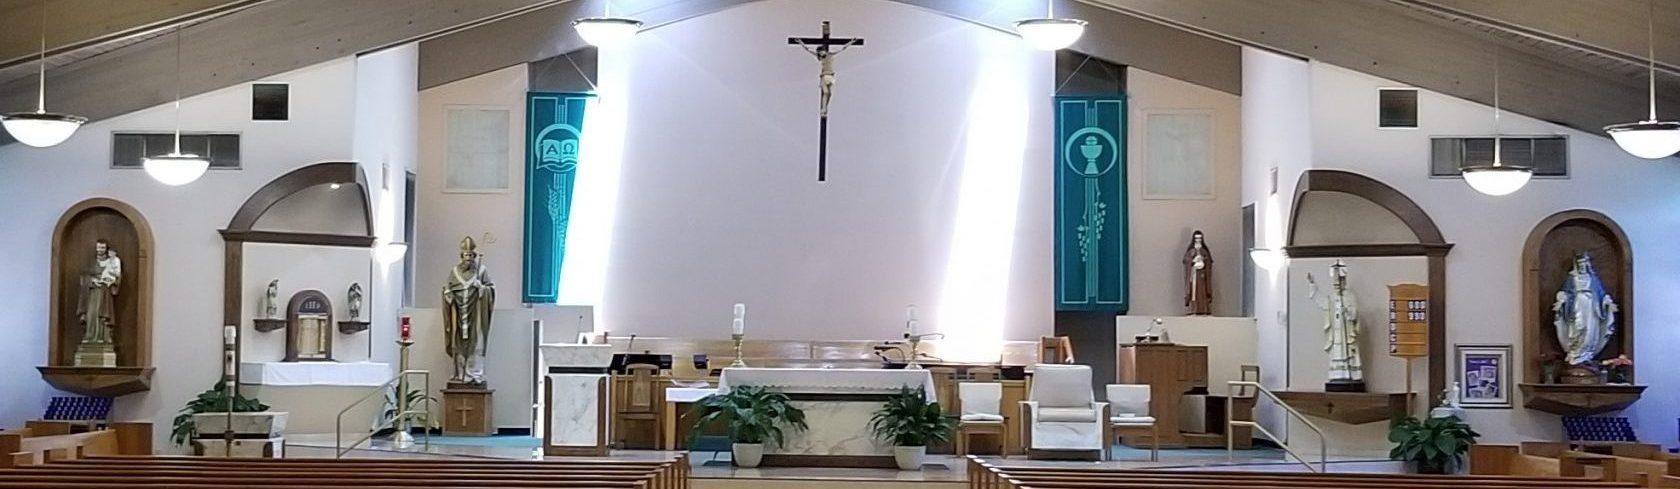 Liturgical Calendar – St. Patrick Catholic Church within Free Catholic Liturgical Calendar For 2020